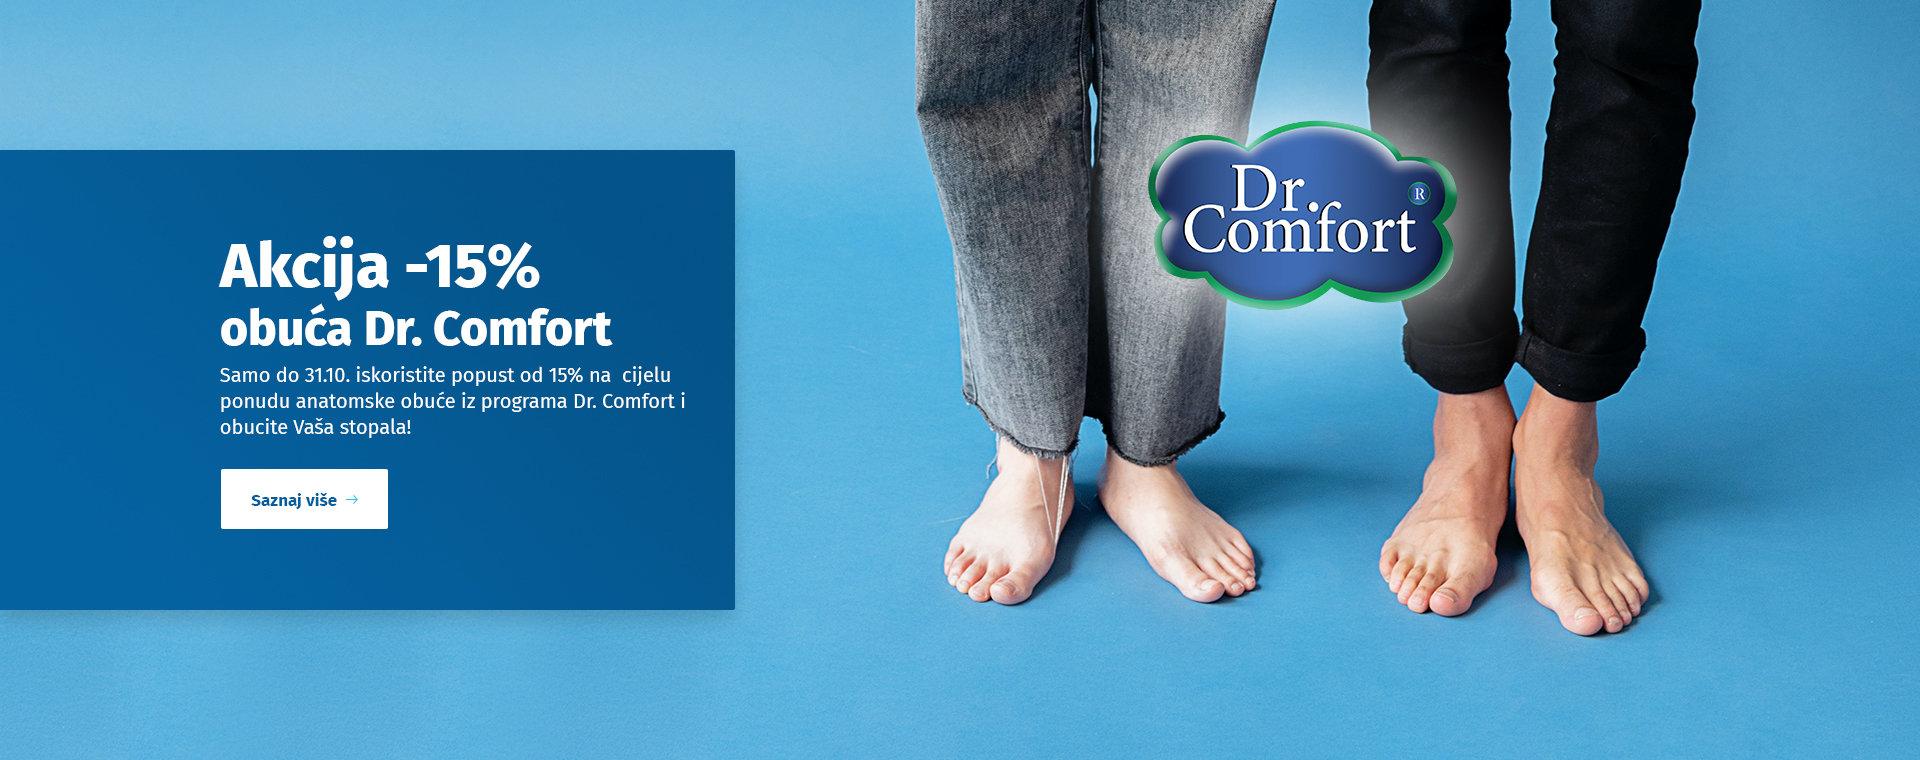 Dr. Comfort akcija